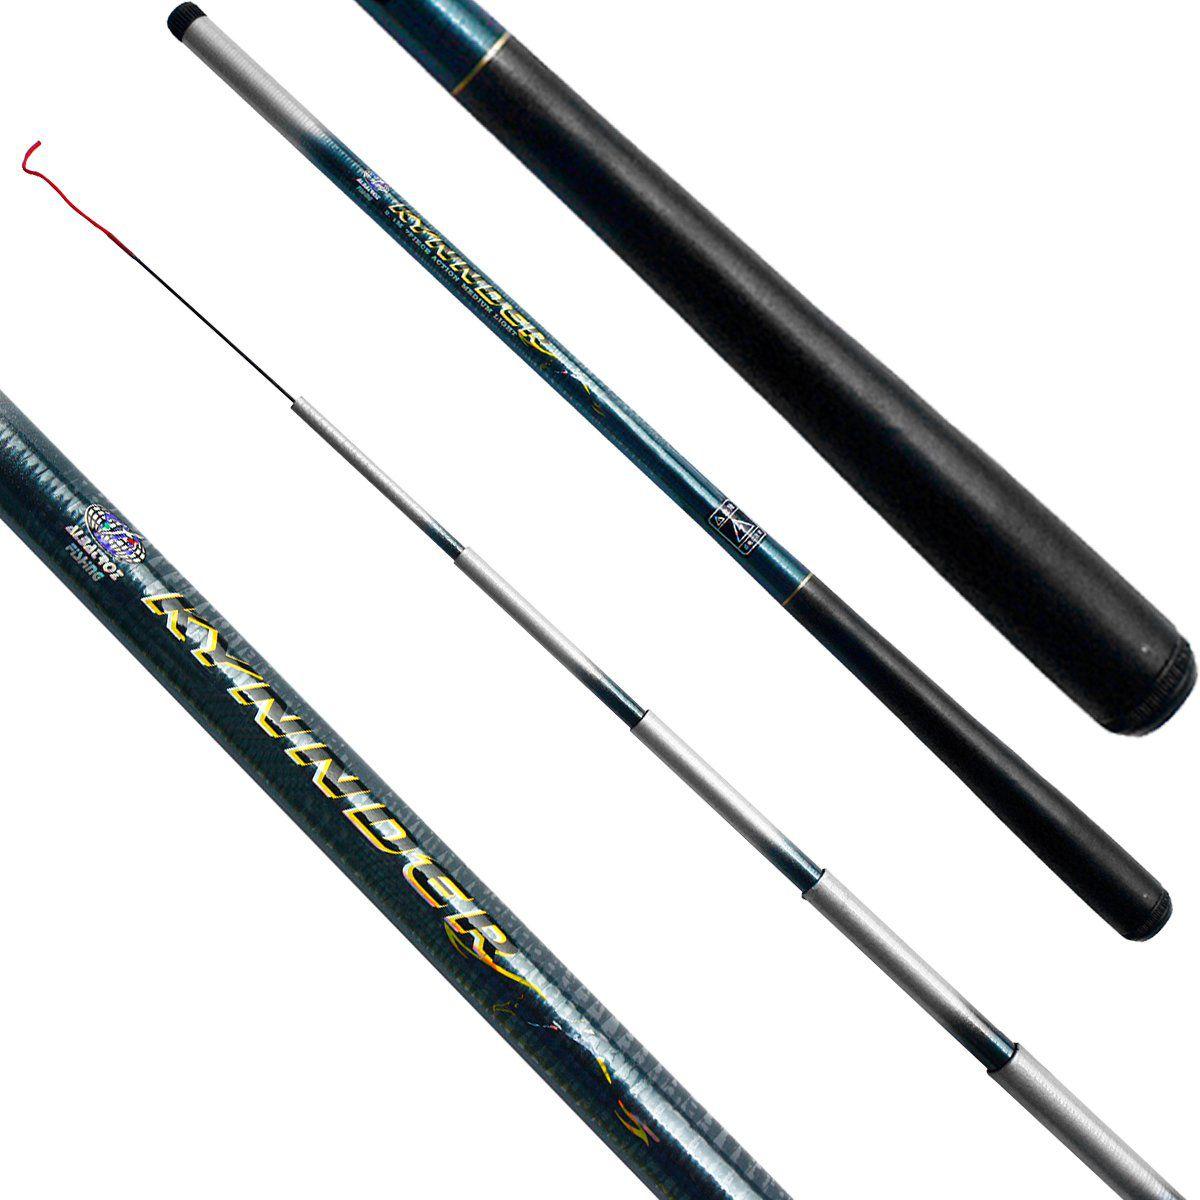 Vara Telescópica Albatroz Fishing Kynnder 3913 3,90m 13s